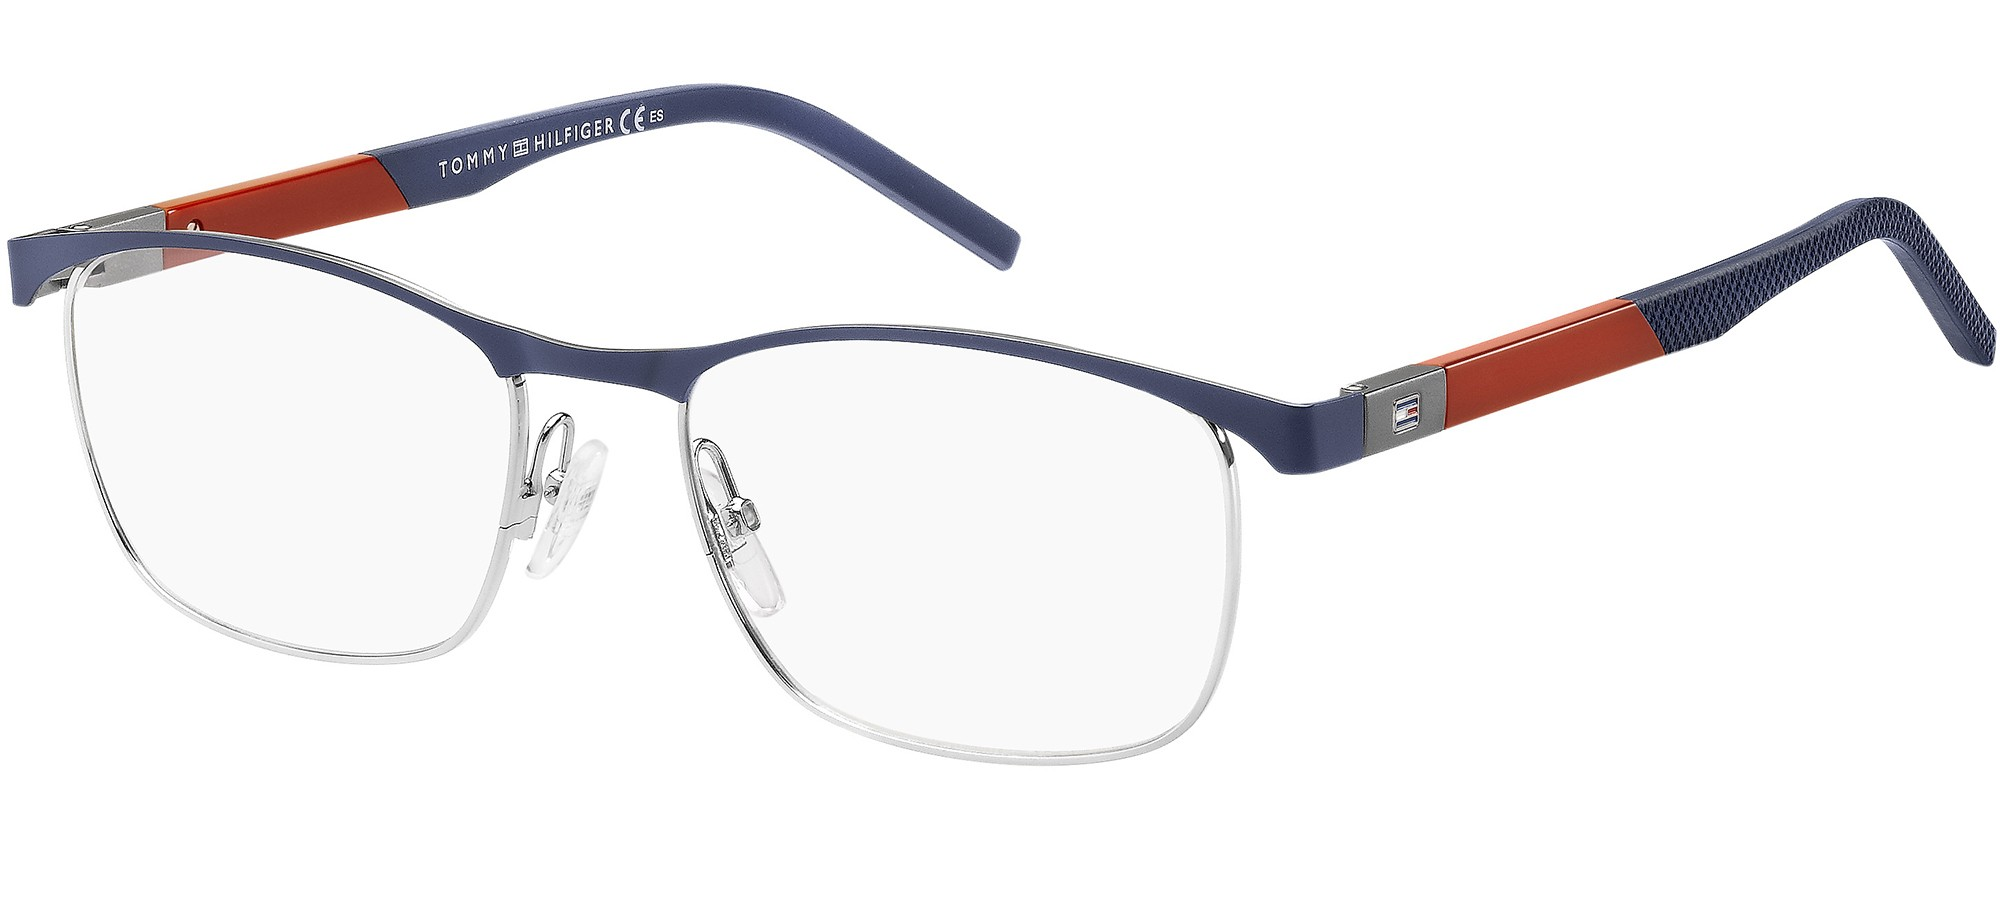 Tommy Hilfiger briller TH 1626/F